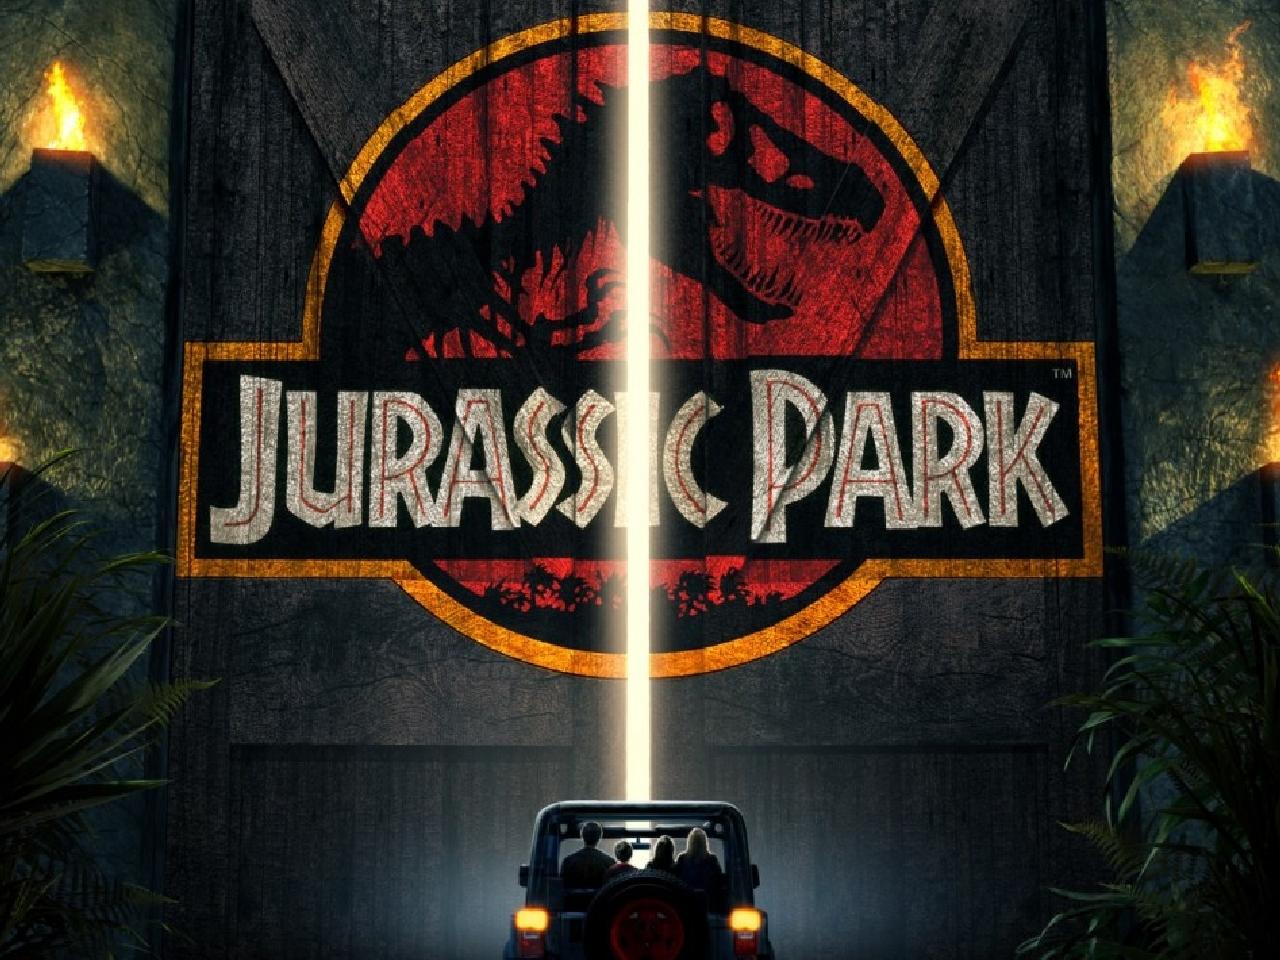 [74+] Jurassic Park Wallpapers on WallpaperSafari